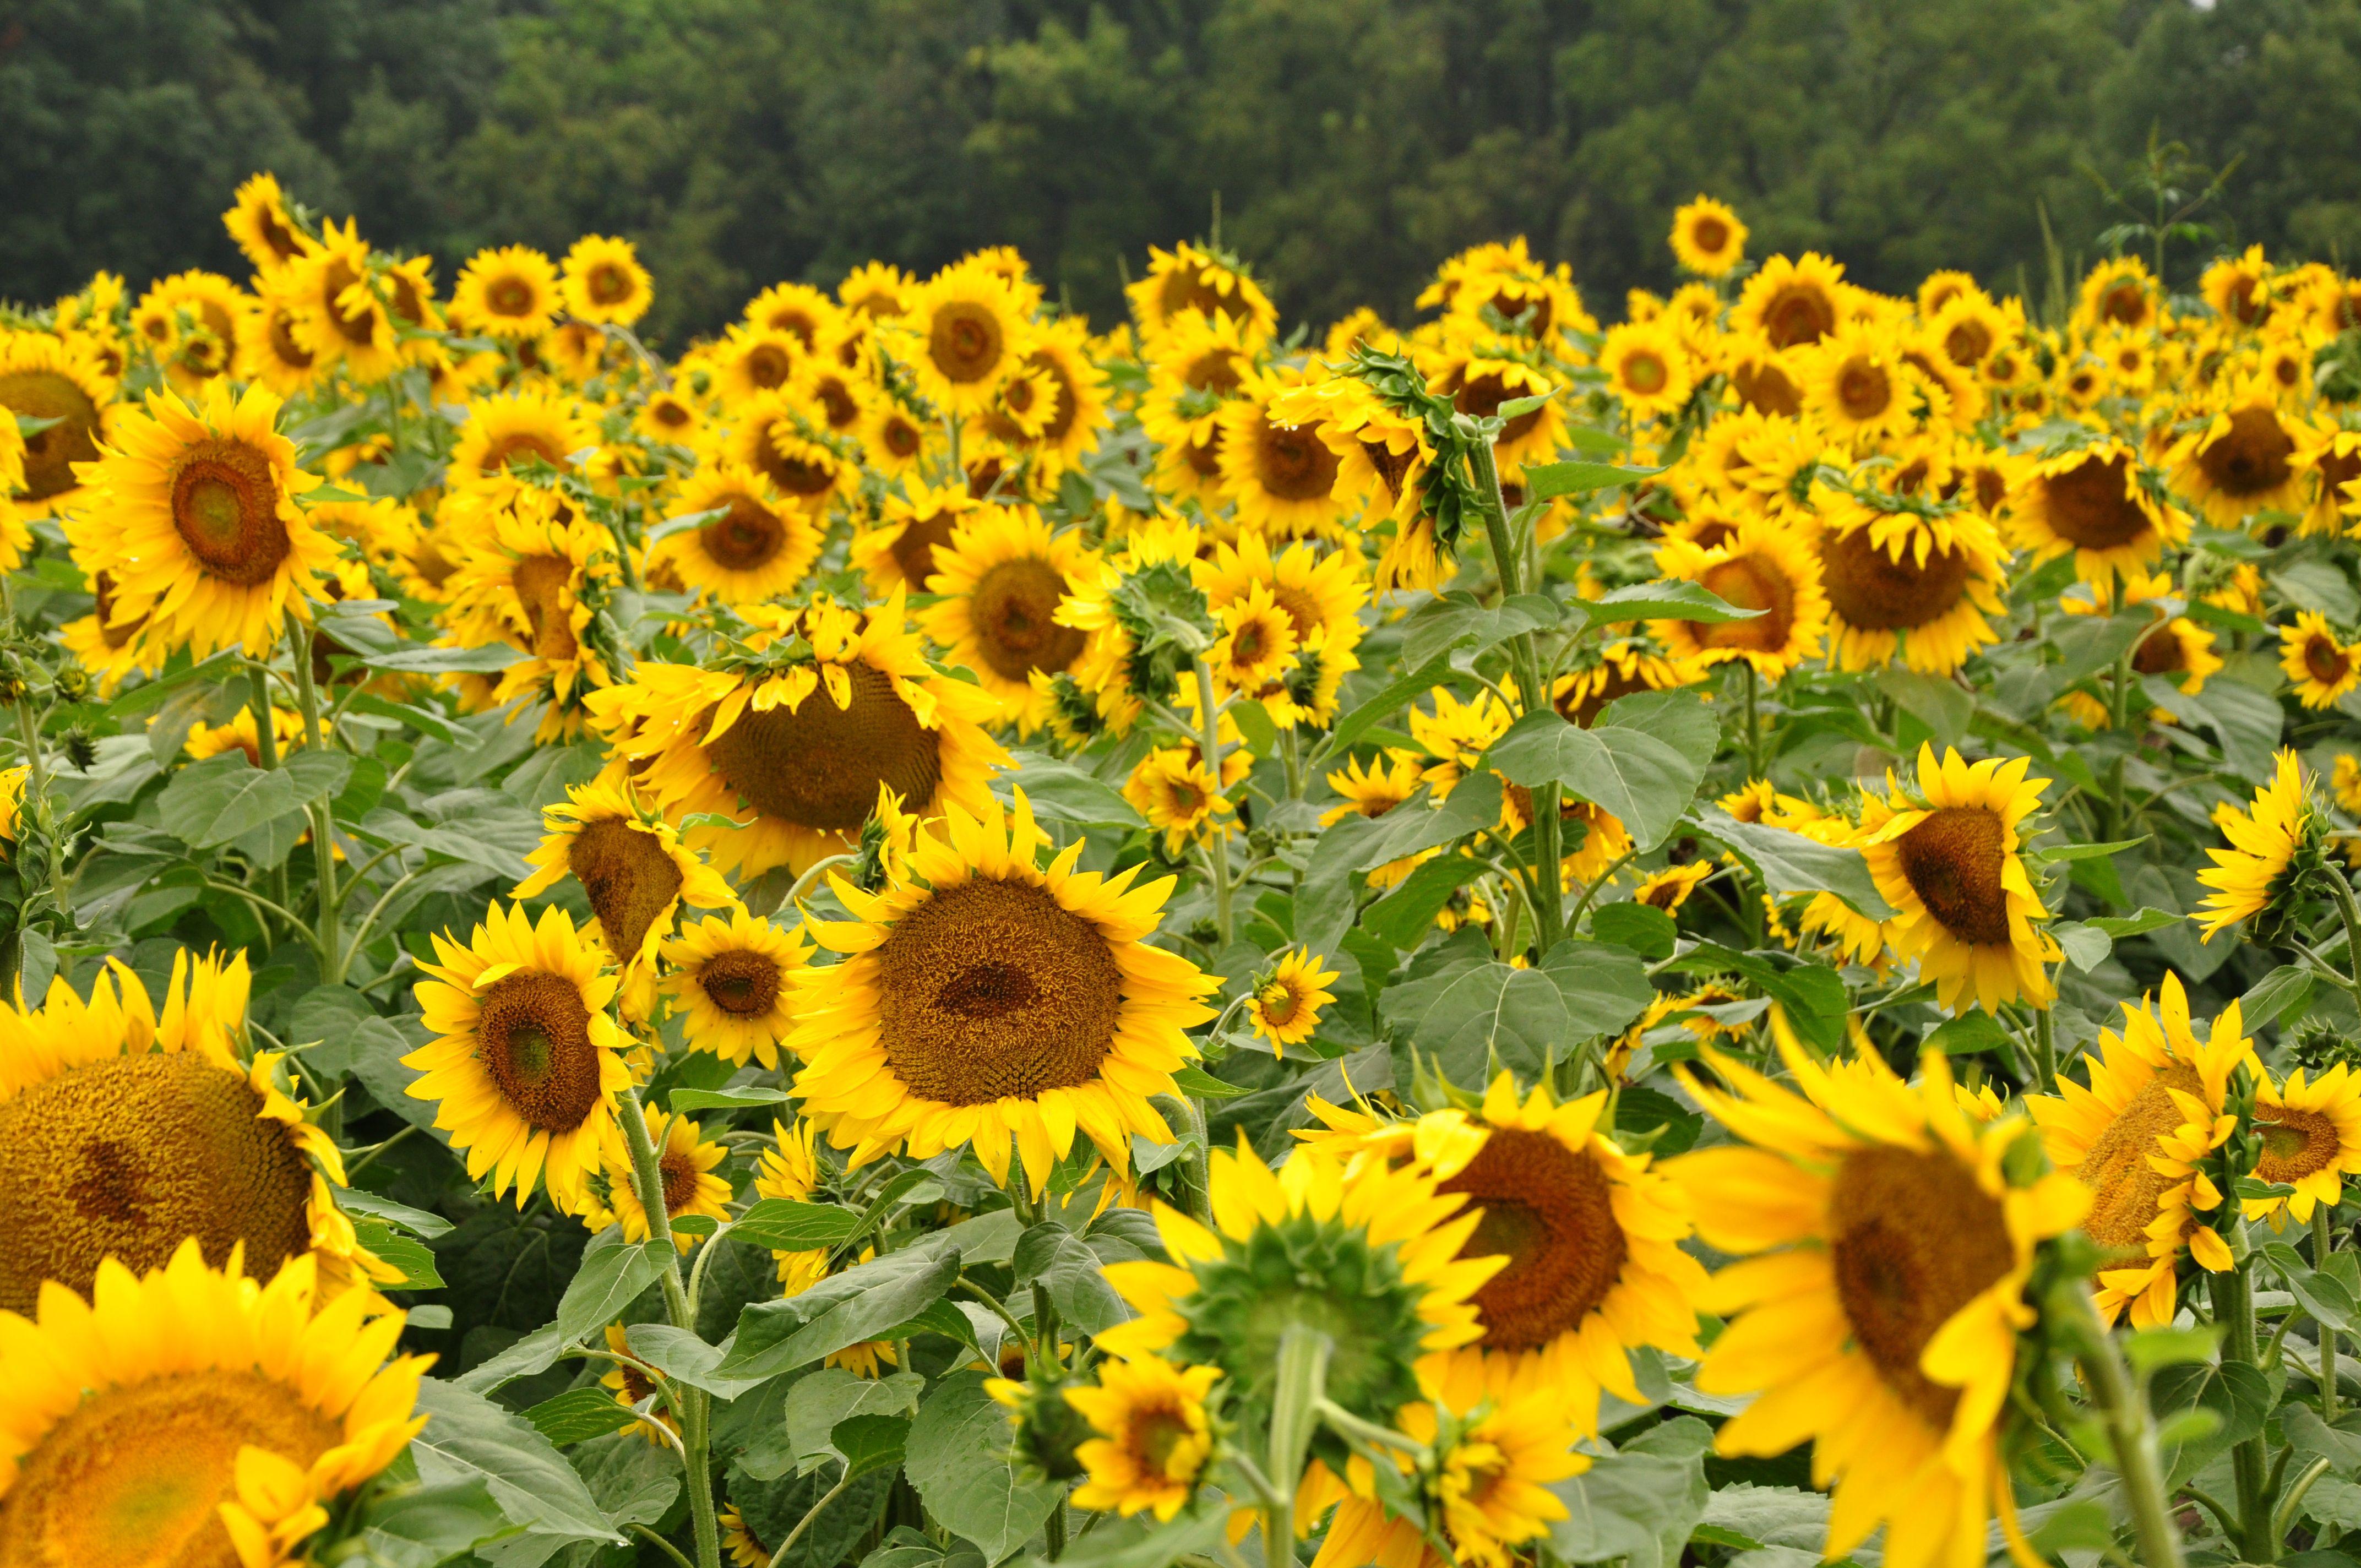 Huge field of sunflowers, so cheery.